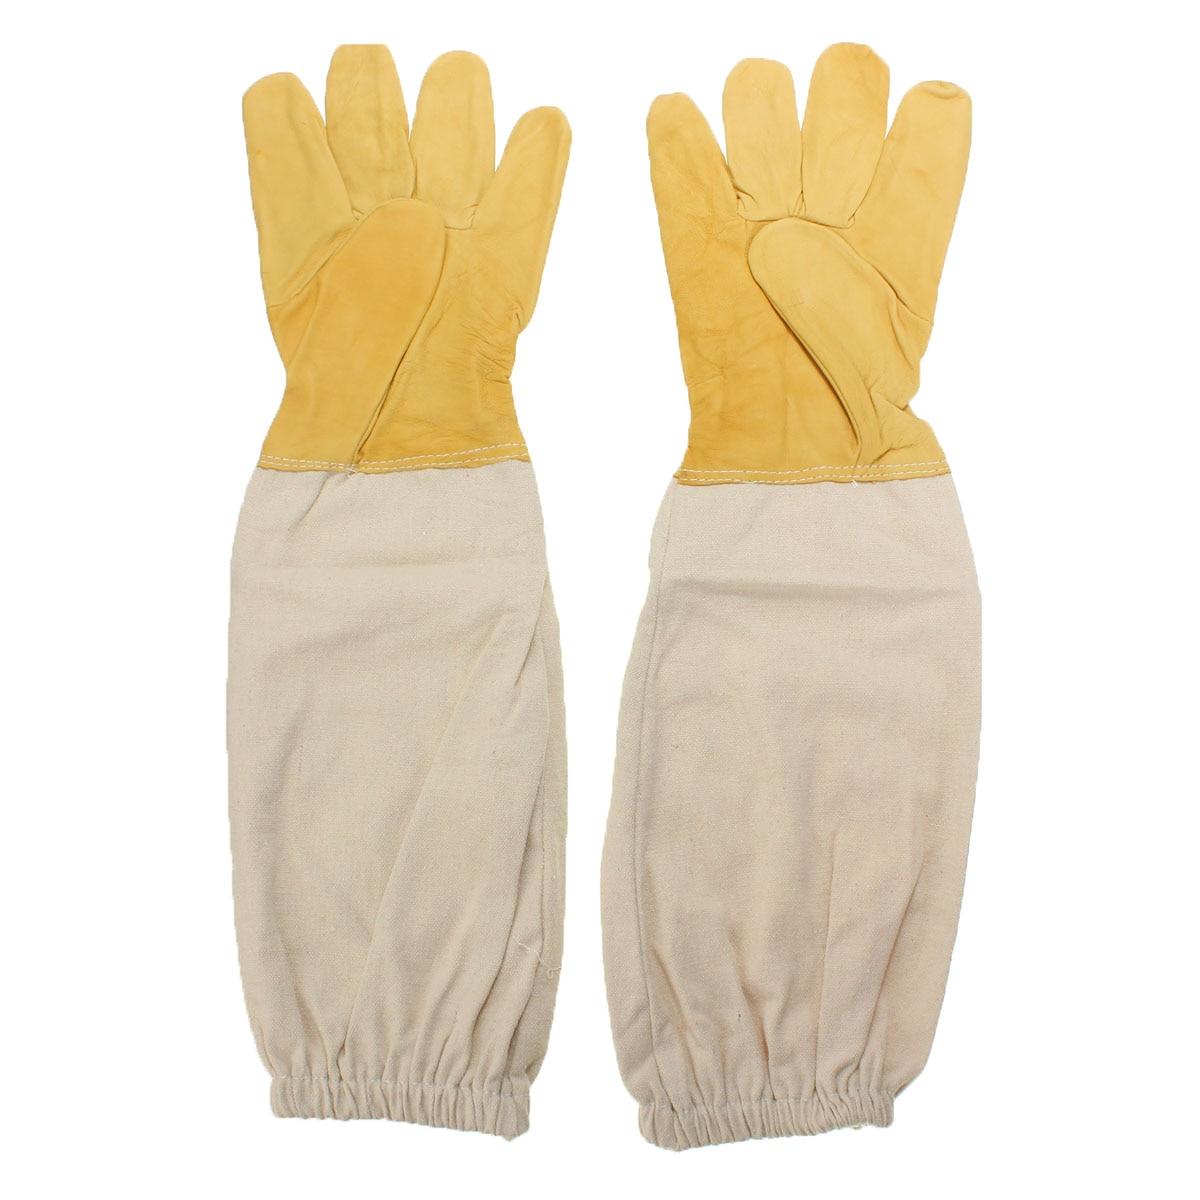 Yellow and white Pair Beekeeping Goatskin Cape Gloves XXL Sheepskin W/ Vented Long Sleeves Guard New комплектующие для кормушек beekeeping 4 equipment121mm 91 158